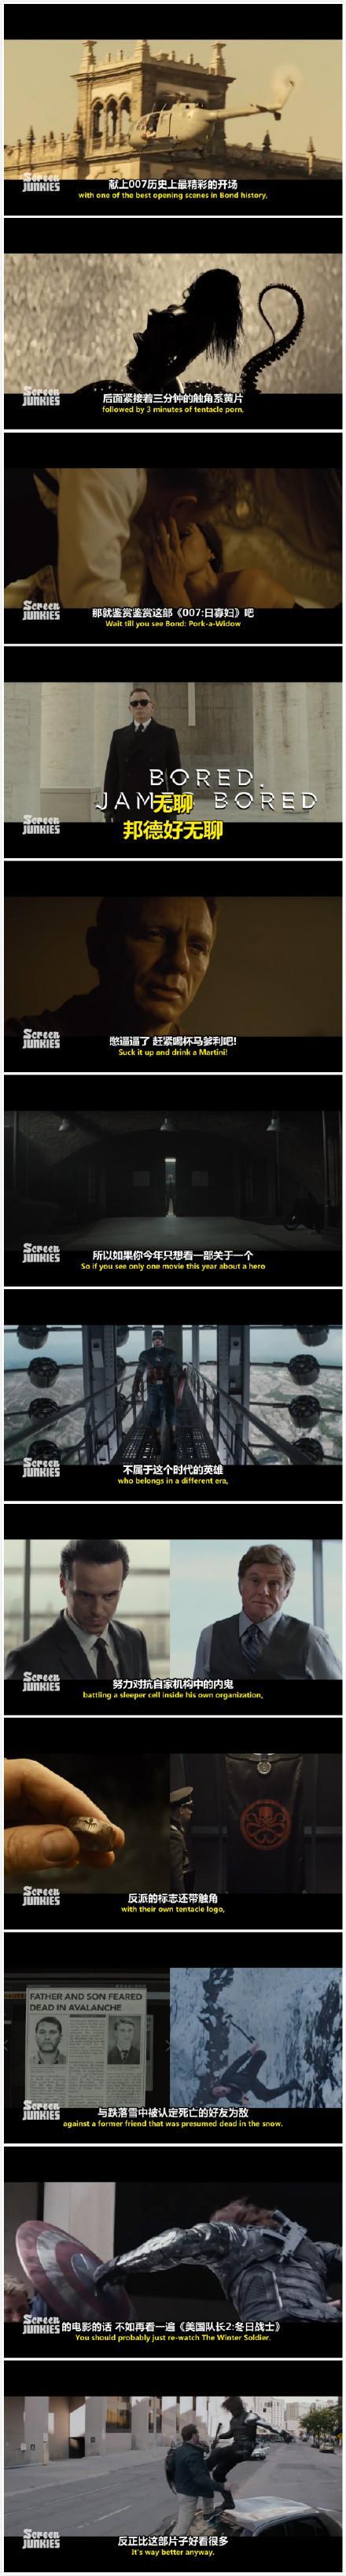 Honest Trailer 诚实预告片吐槽《007:幽灵党》#双语字幕#